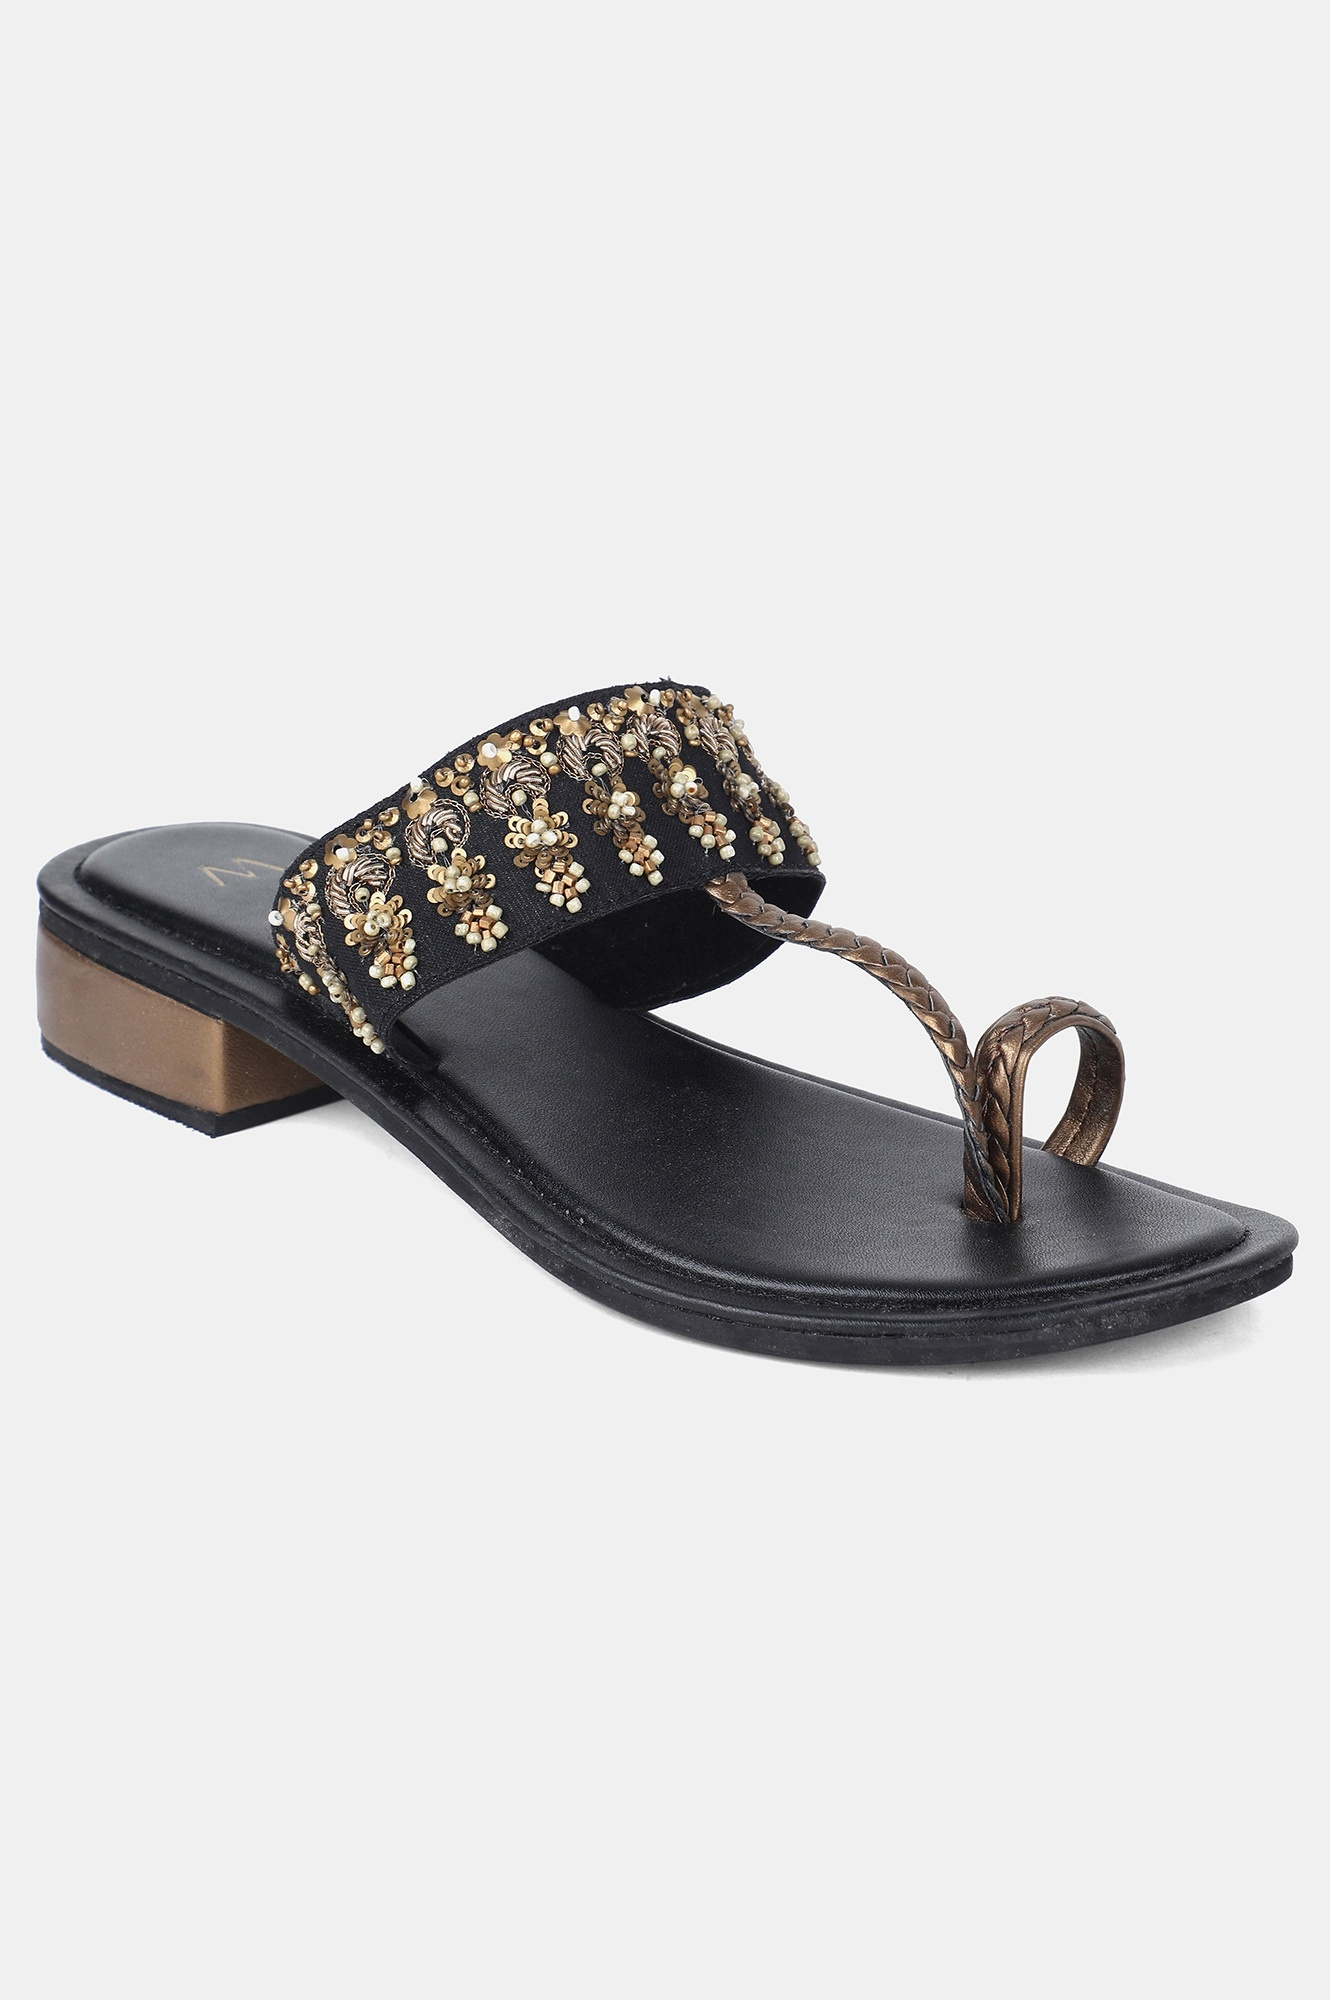 W | W Black Almond Toe Embroidered Block Heel